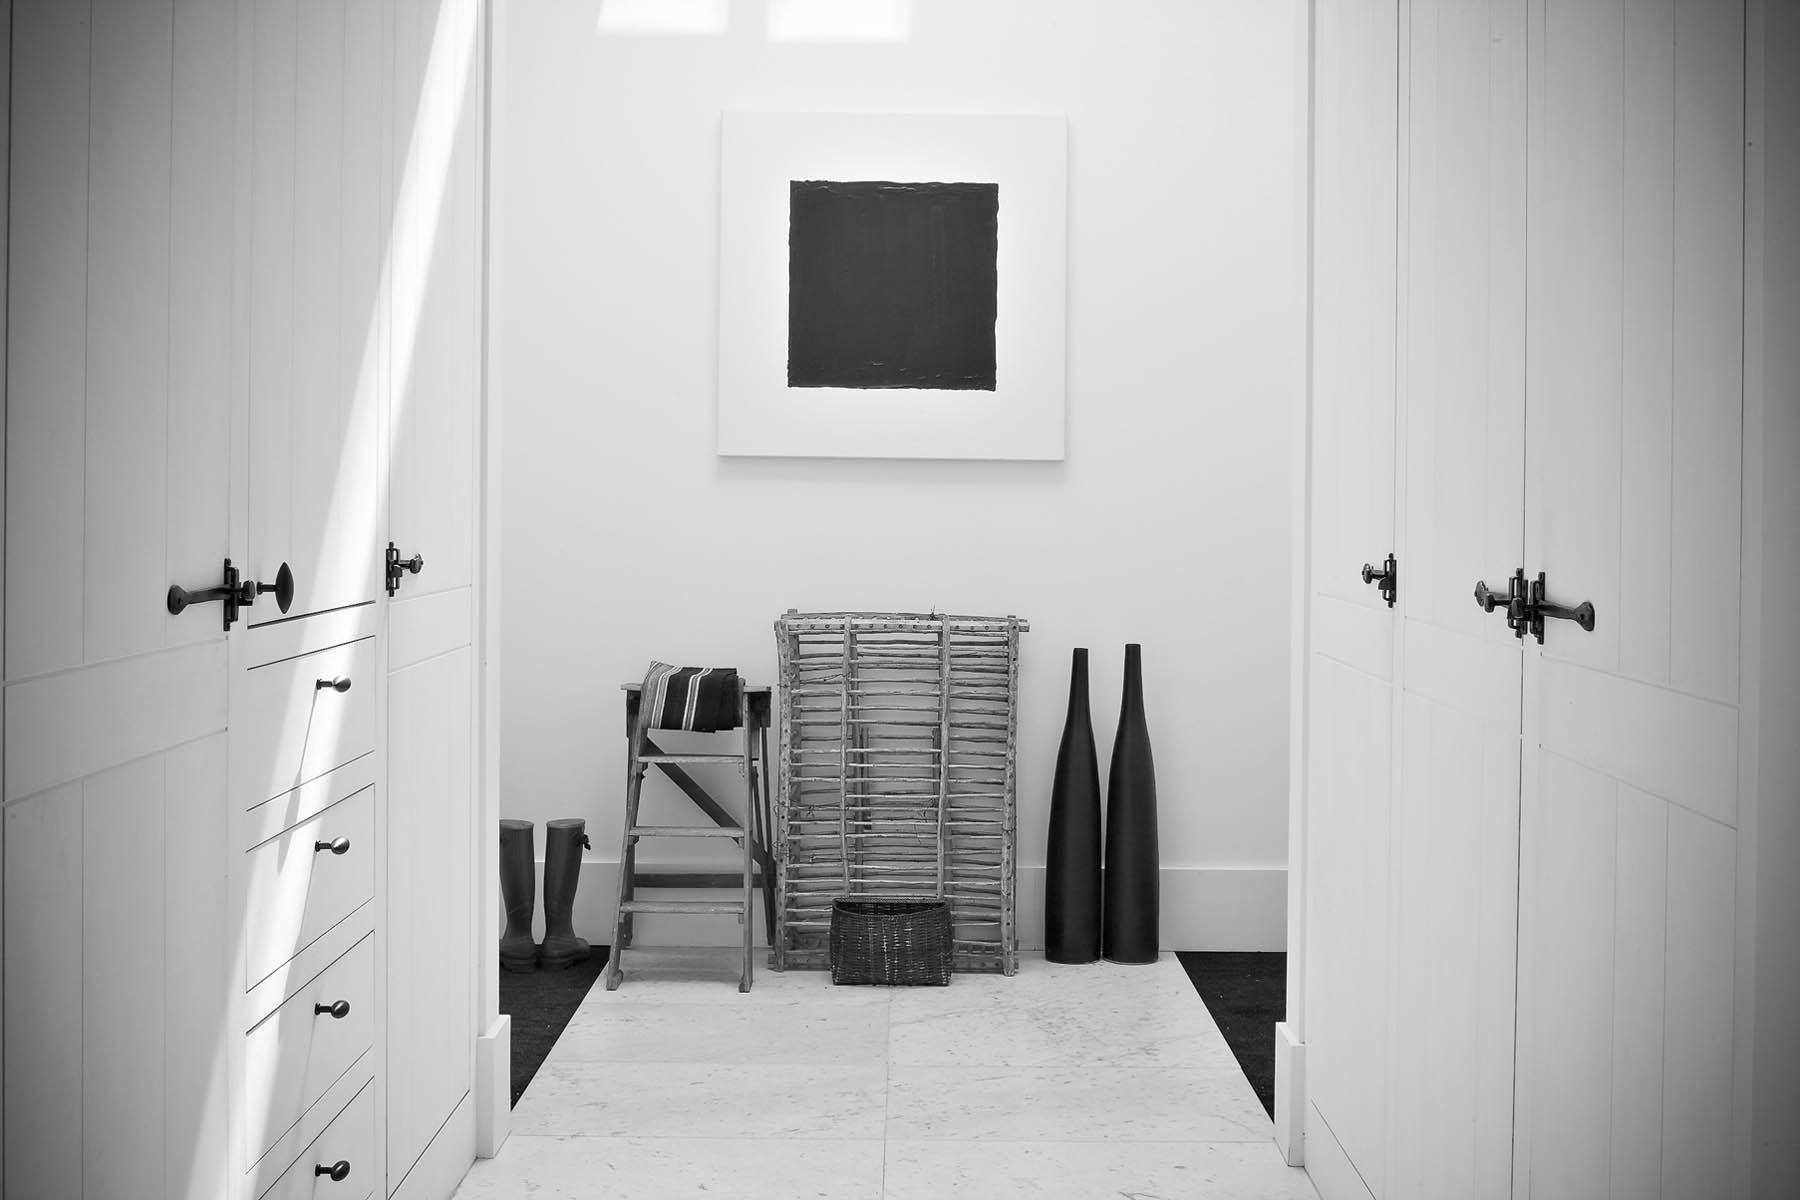 k galerij43 Traditional Meets Modern